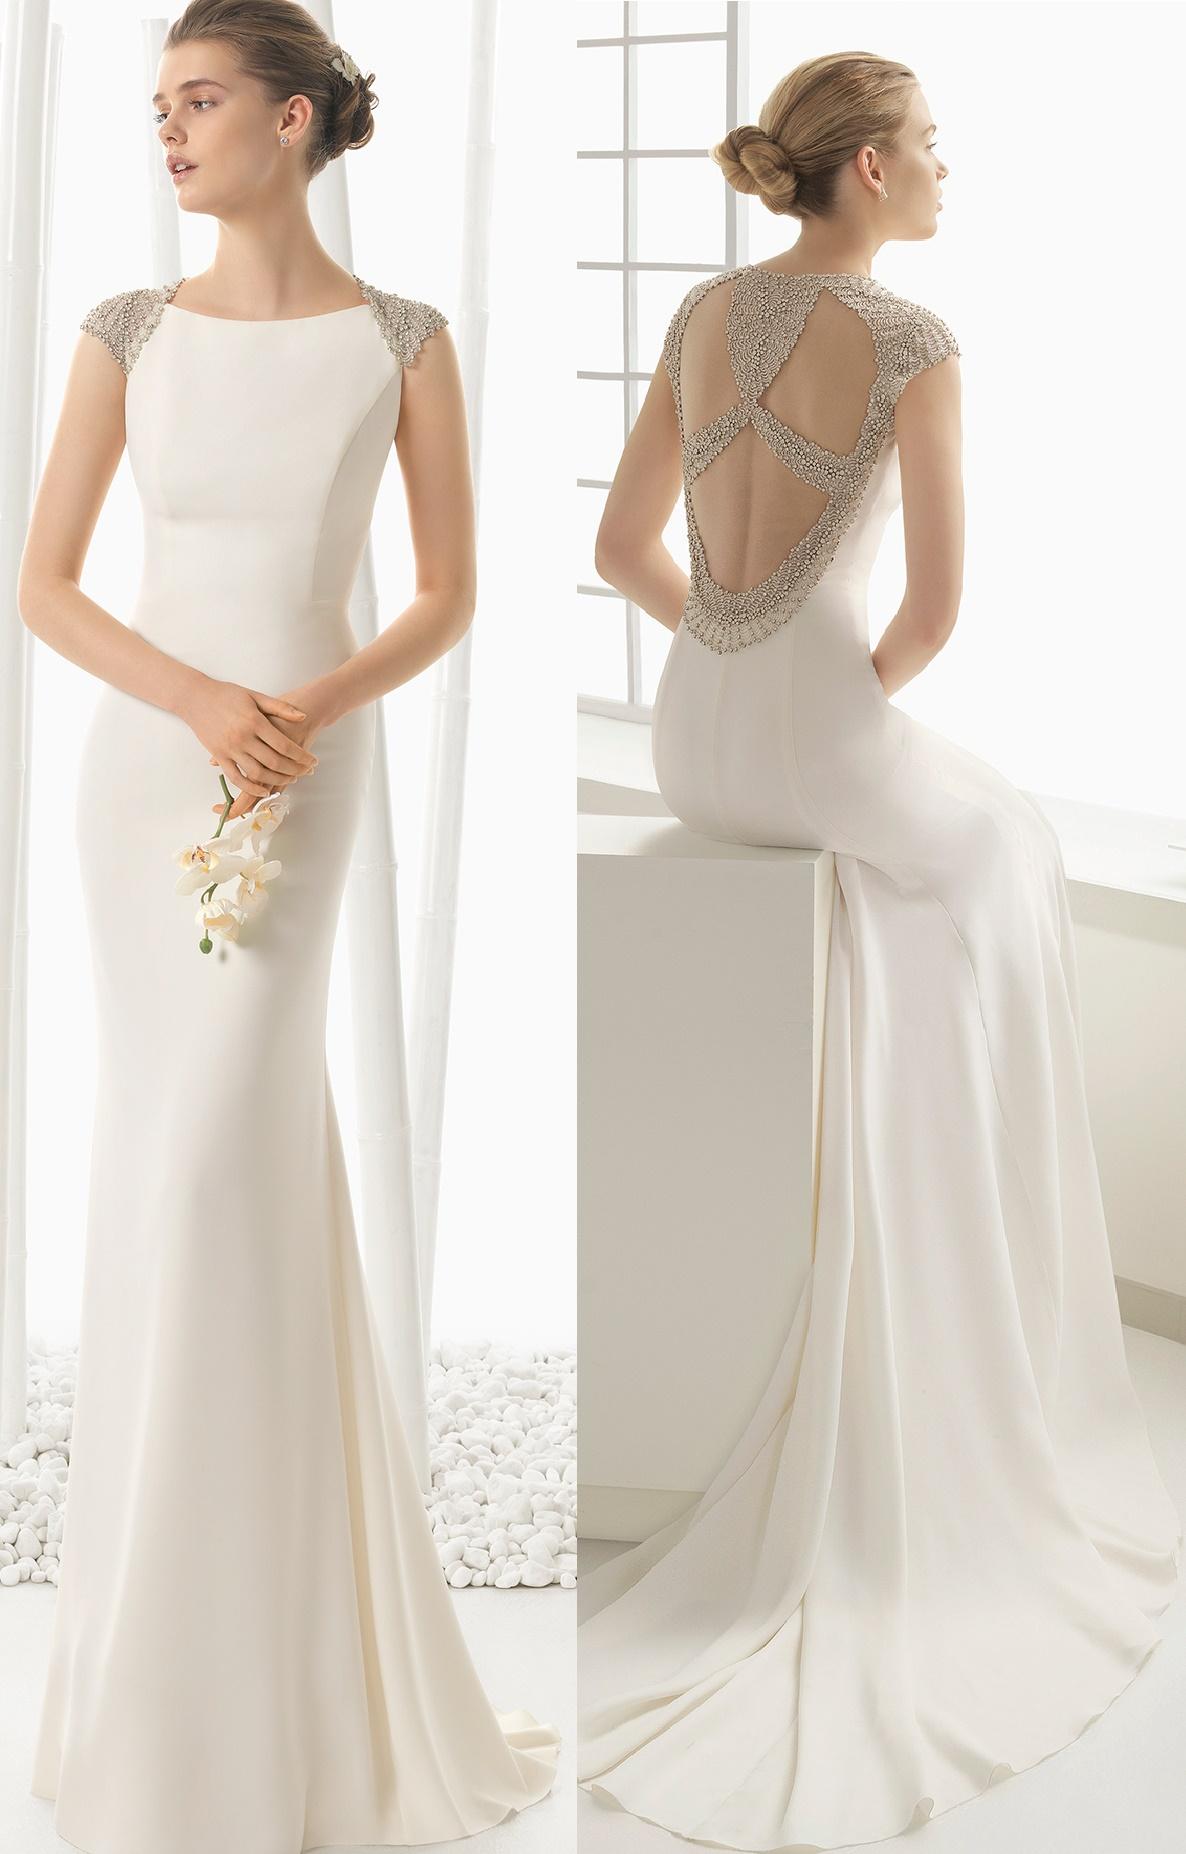 Rosa Clará5 - Vestidos de Noiva - Bridal Collection 2016